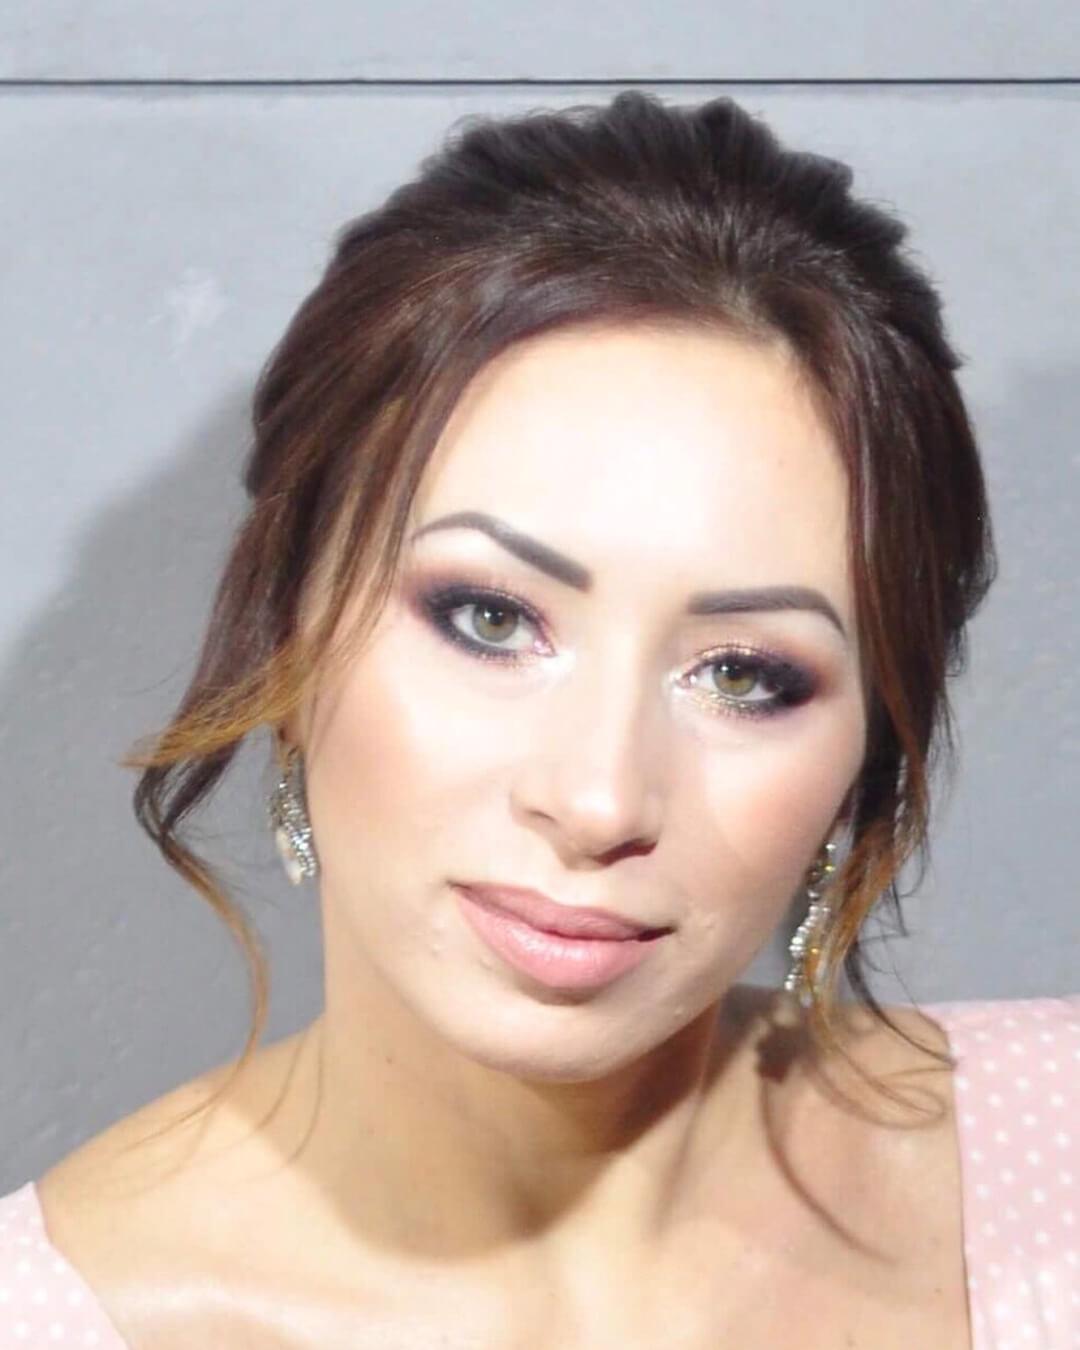 Байделюк Снежана Валерьевна